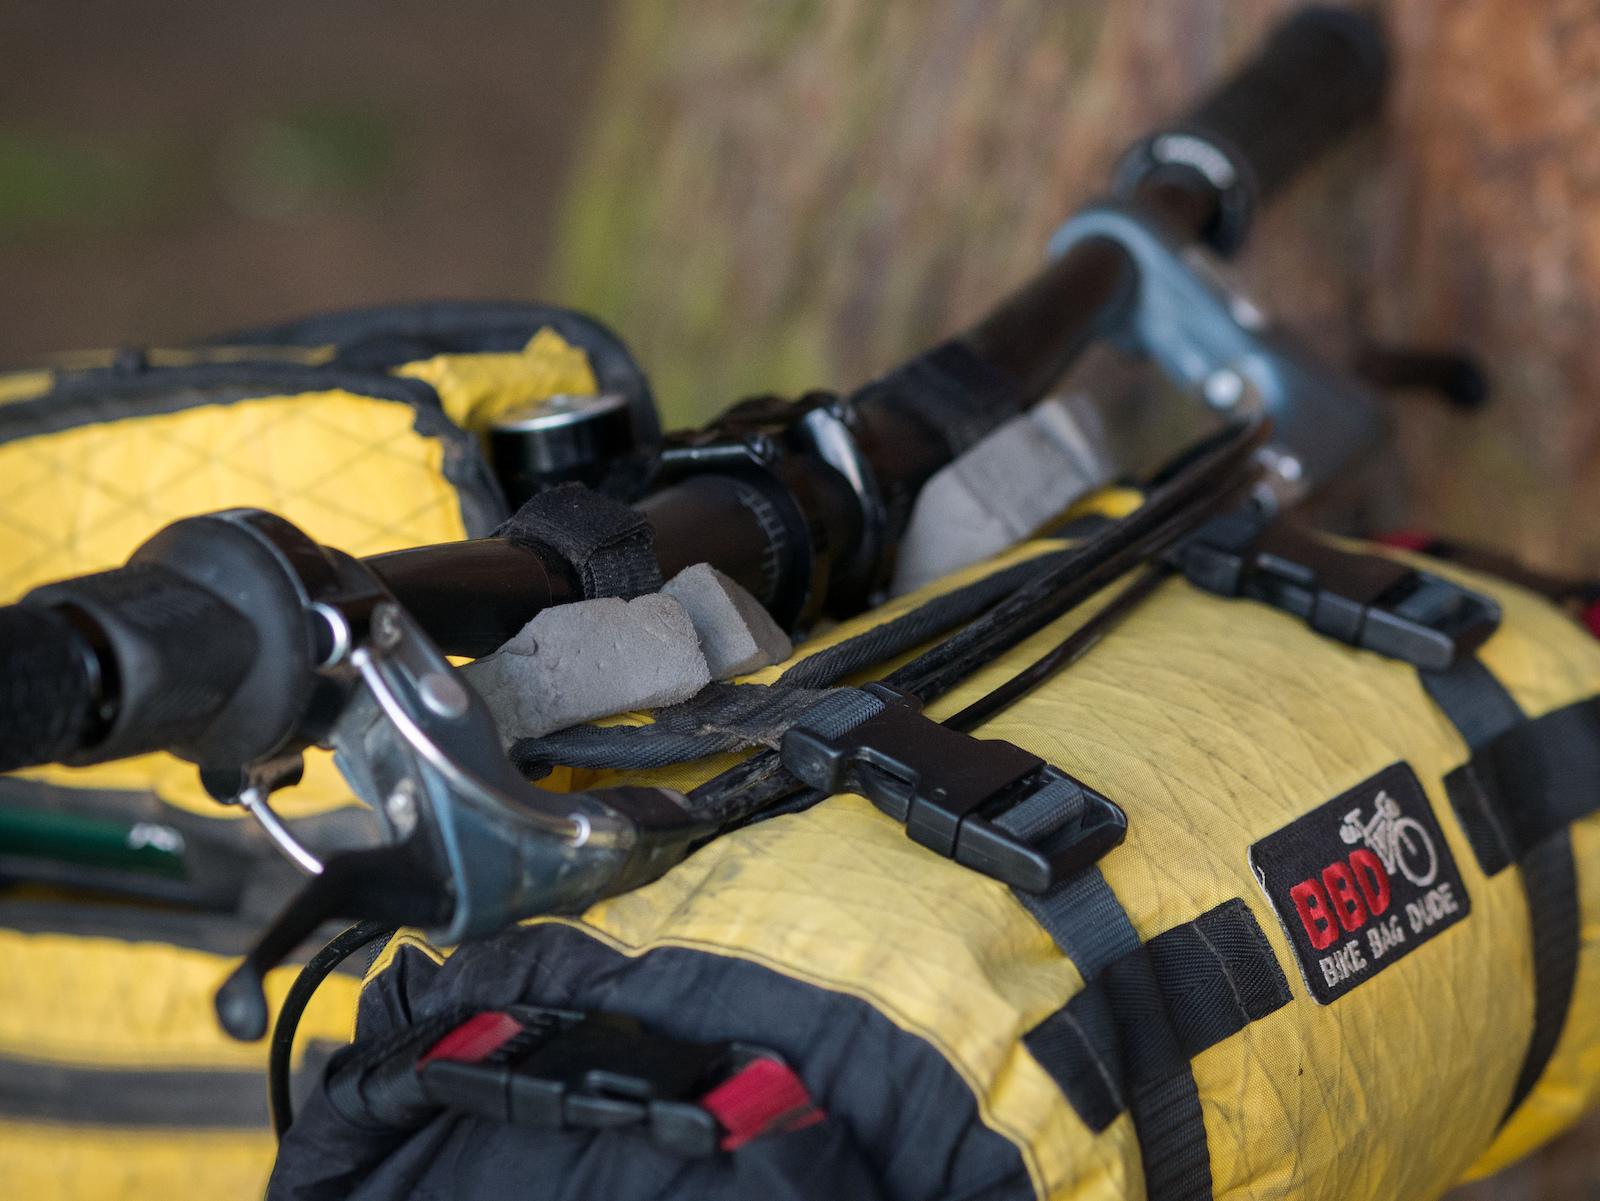 images for Bike Bag Dude bikepacking bags article